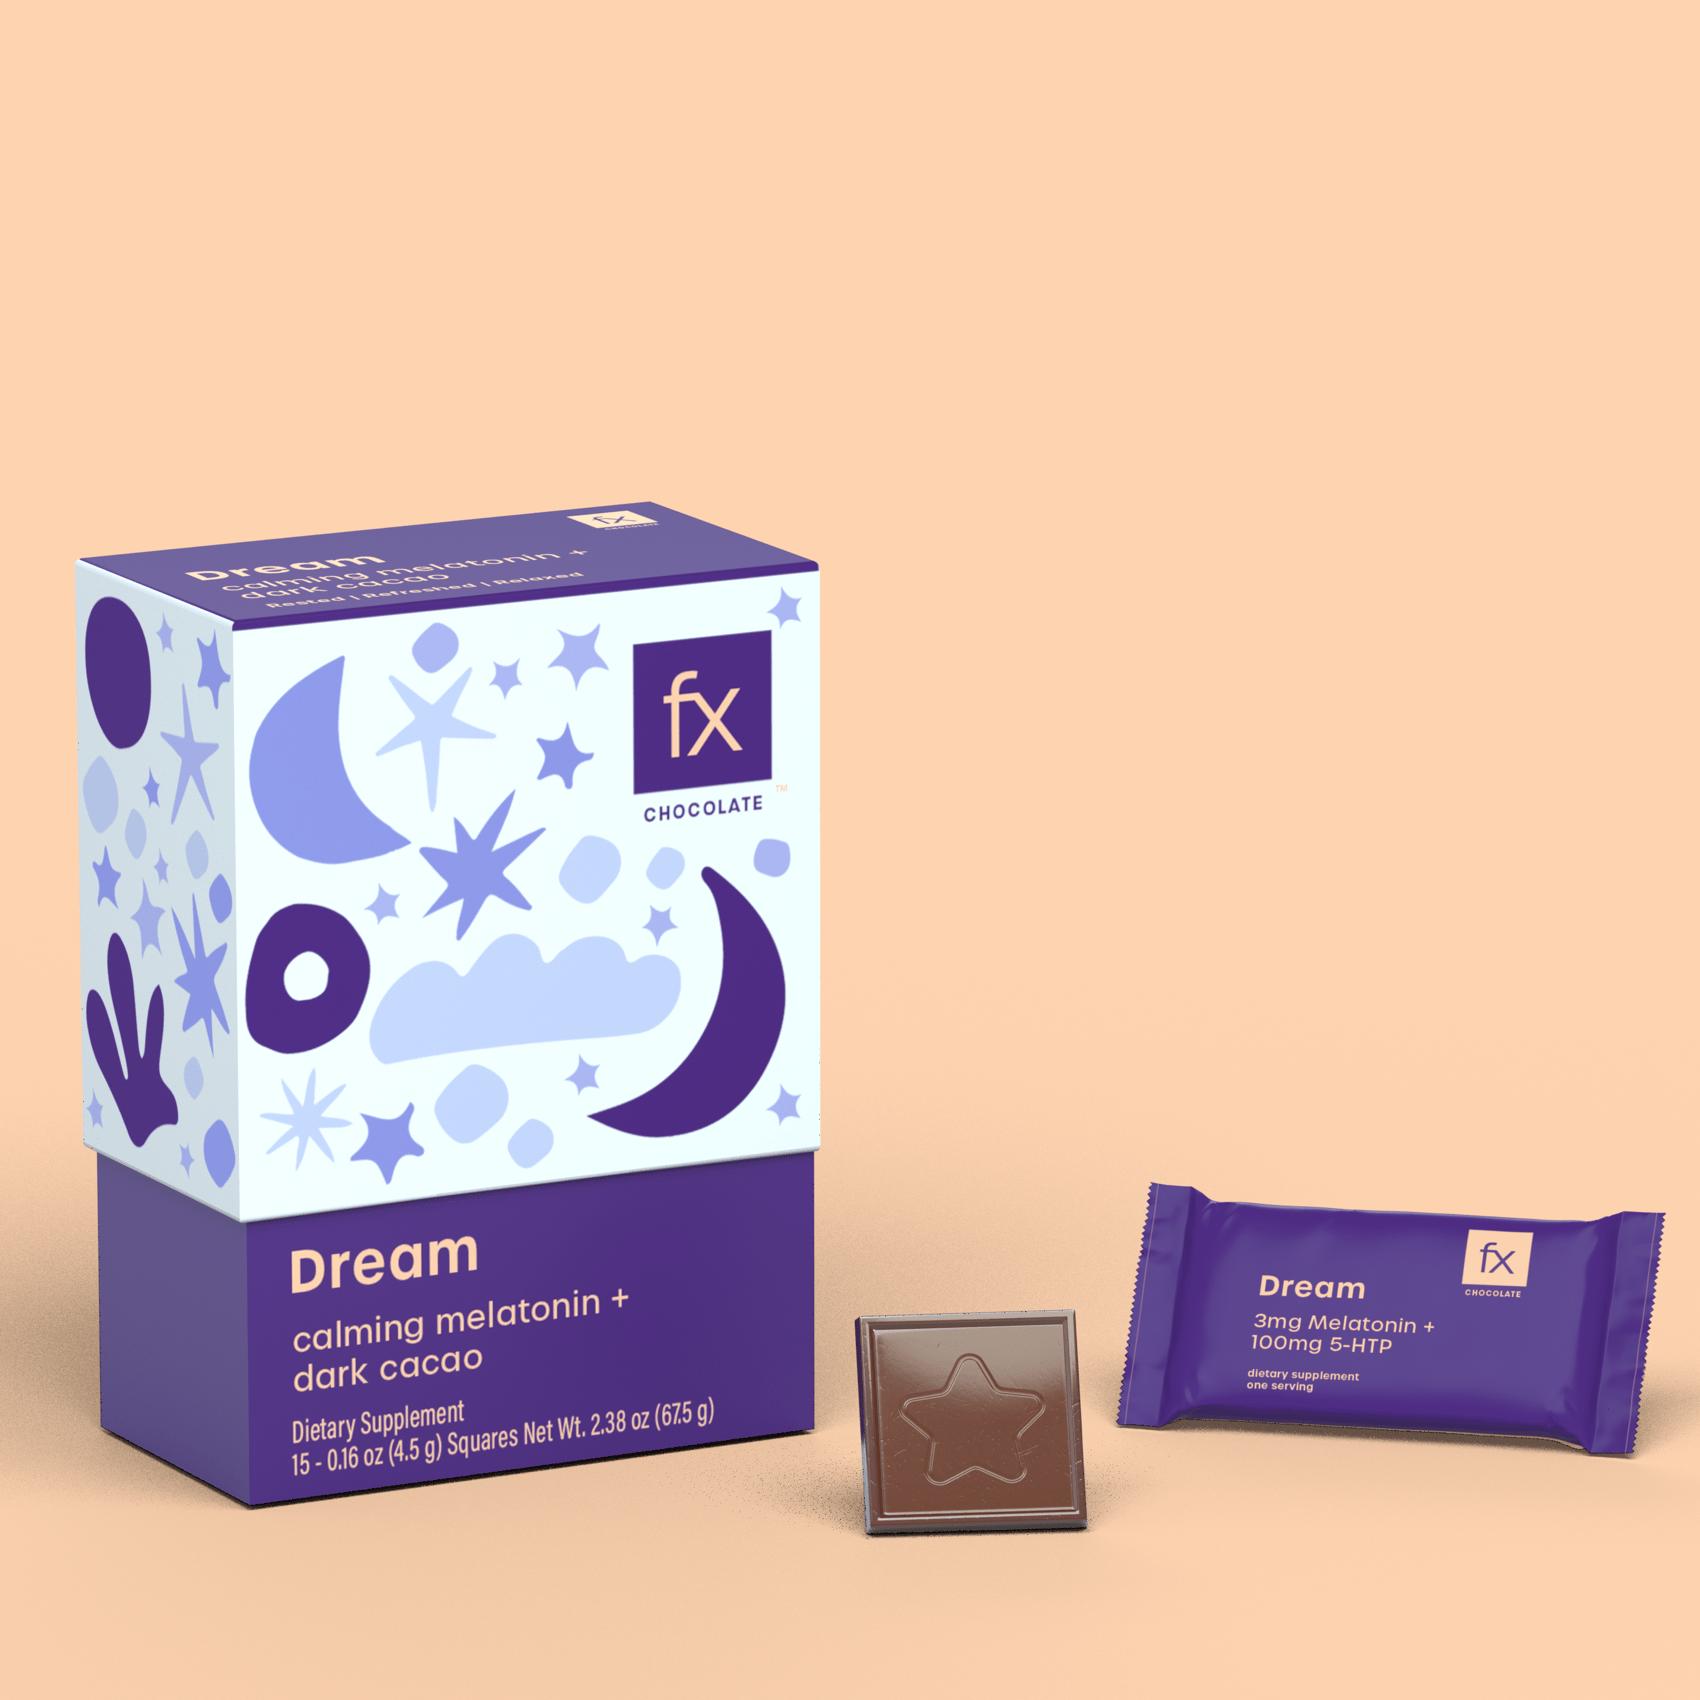 Fx Chocolate Dream